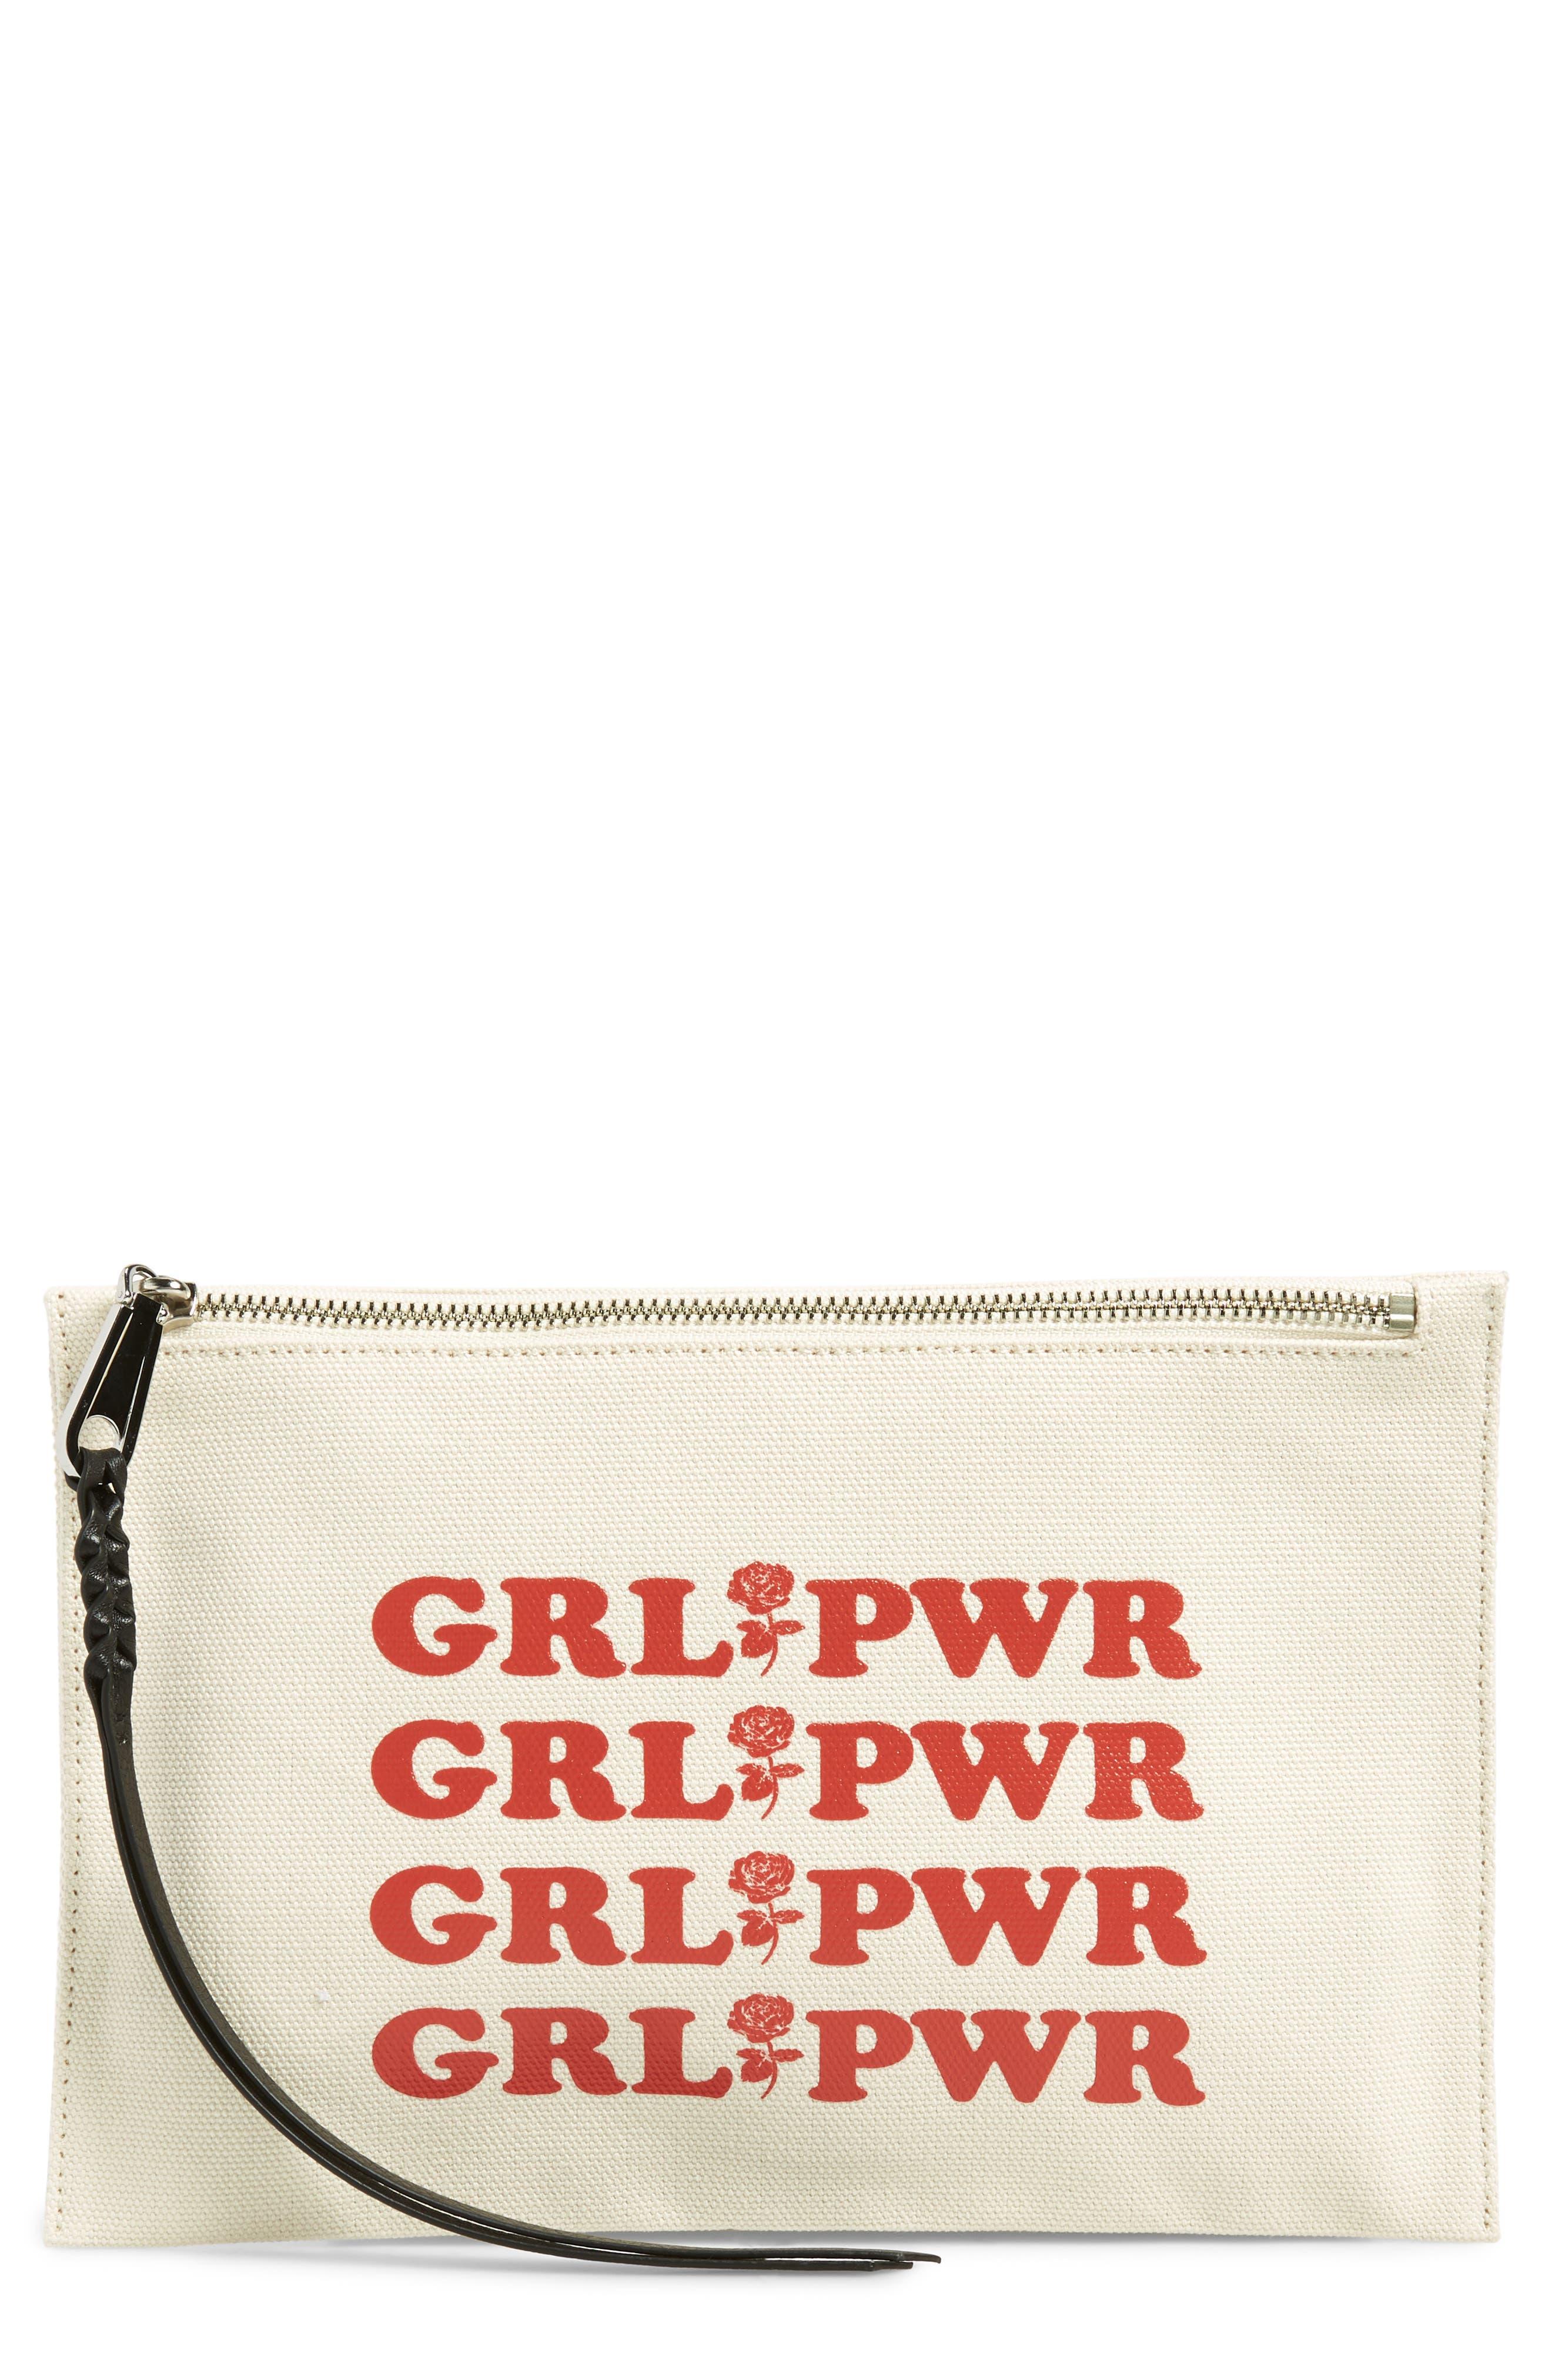 Girl Power Medium Zip Pouch,                             Main thumbnail 1, color,                             CREAM